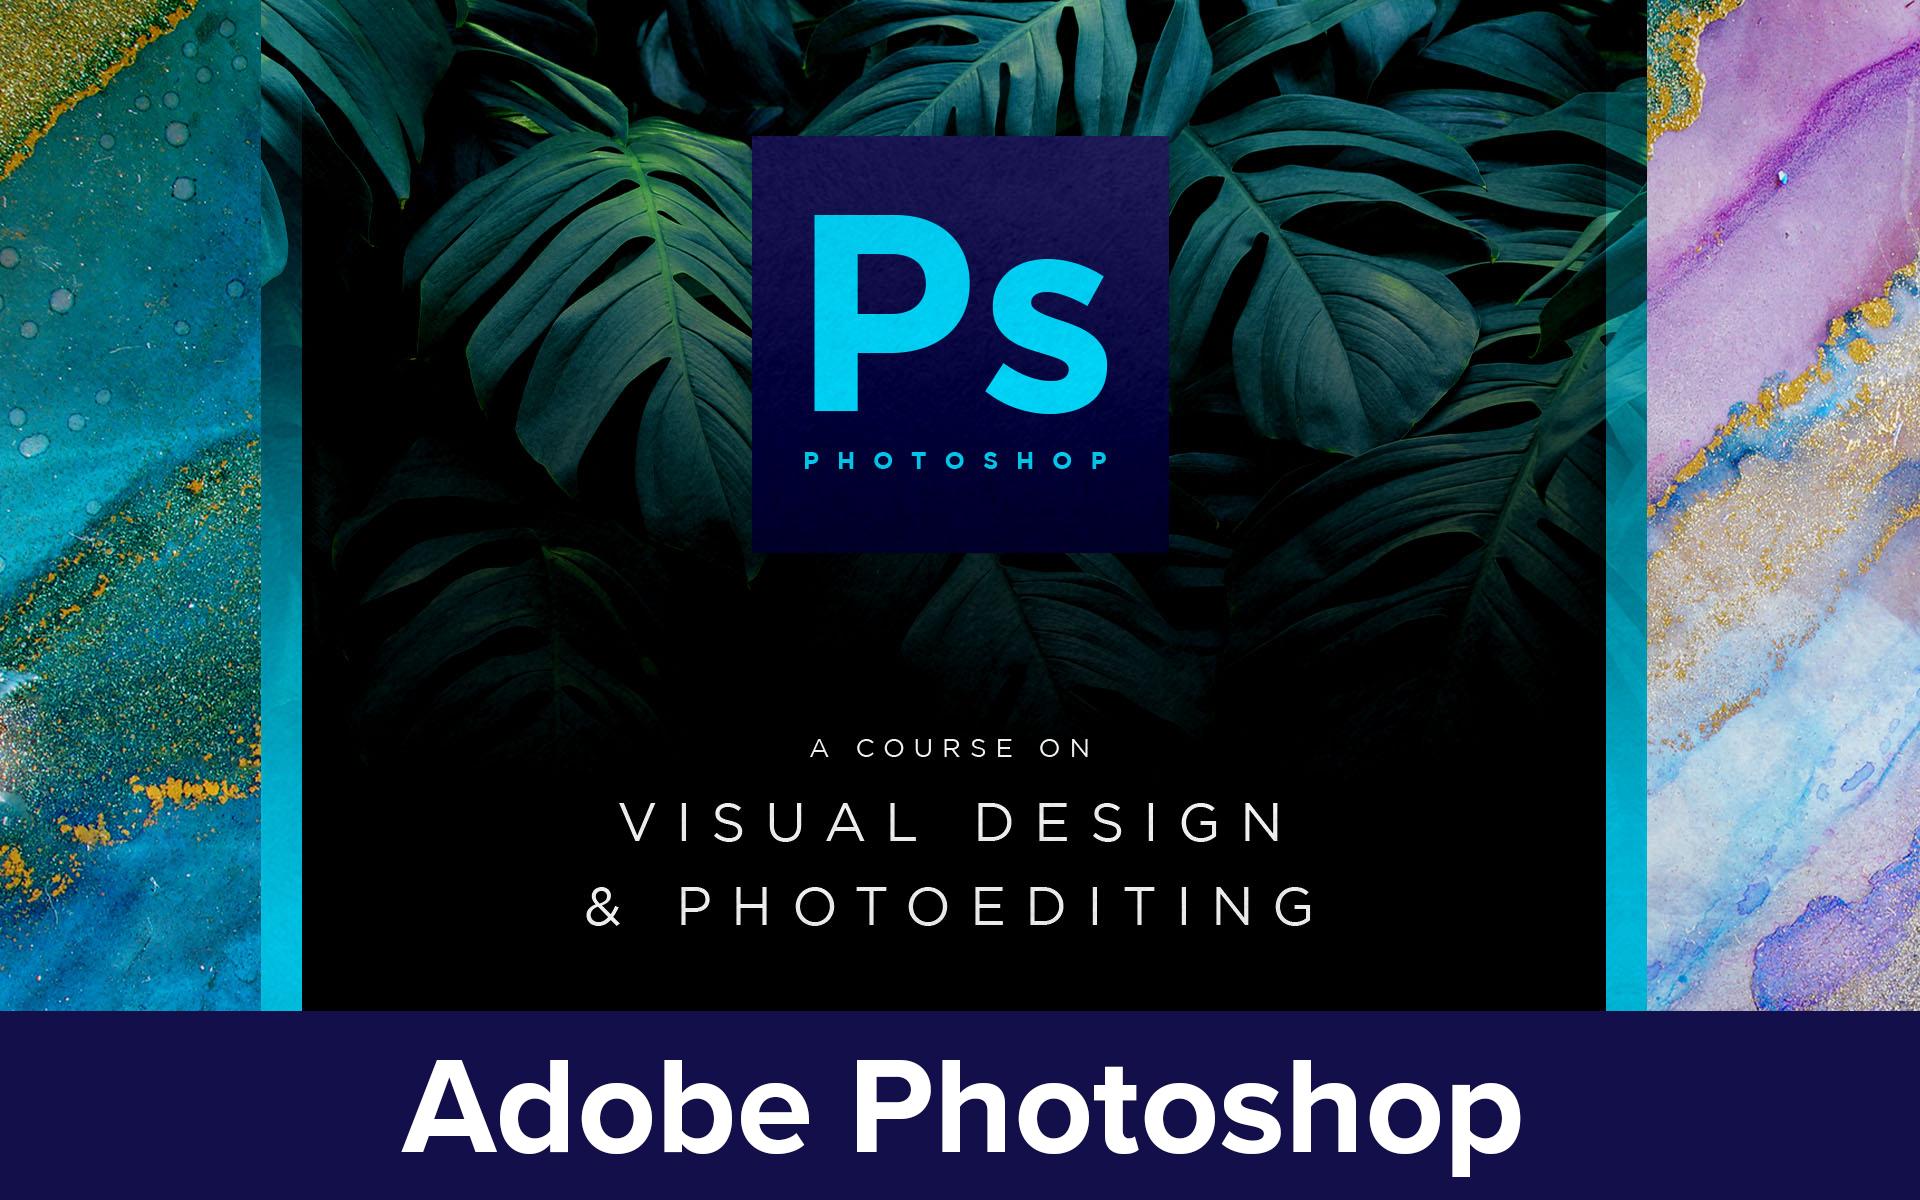 Adobe Photoshop CC18|19|20 course image